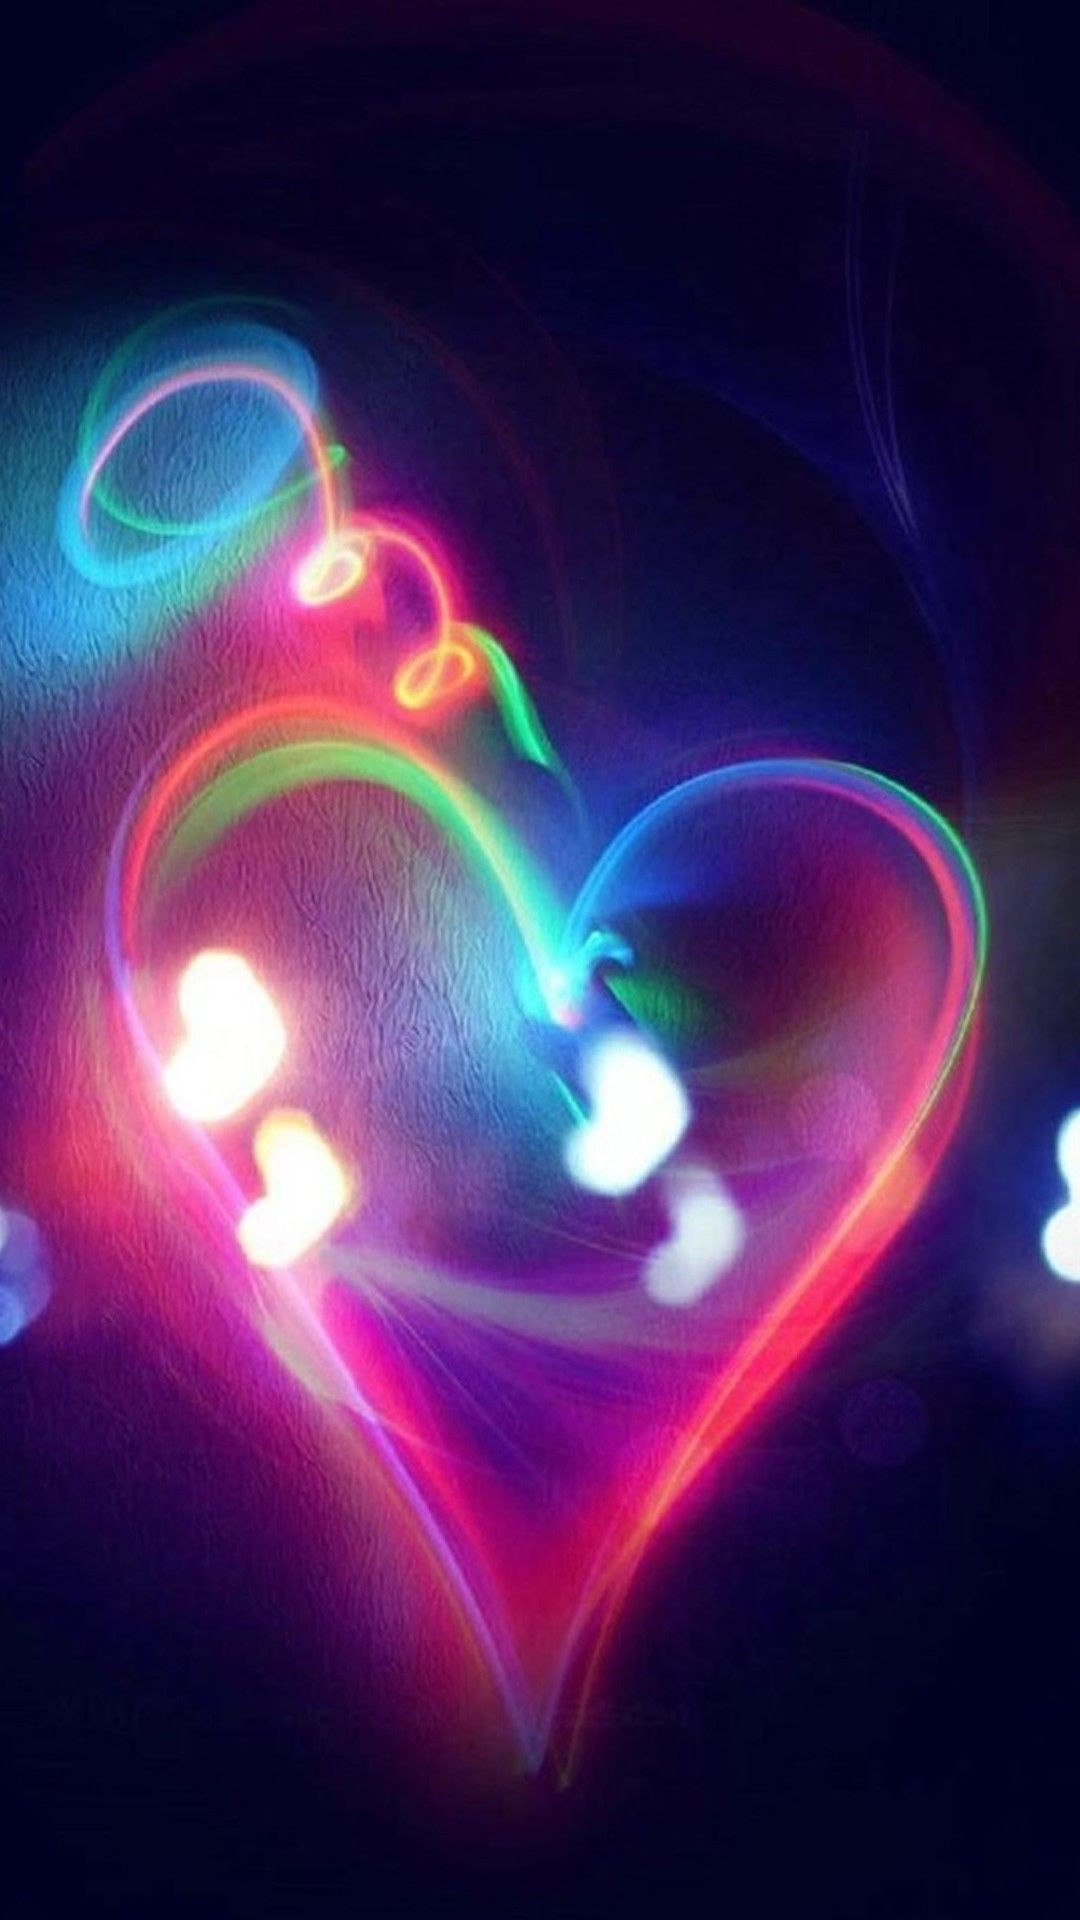 Love Samsung Galaxy Note 3 Wallpapers 84 Heart wallpaper